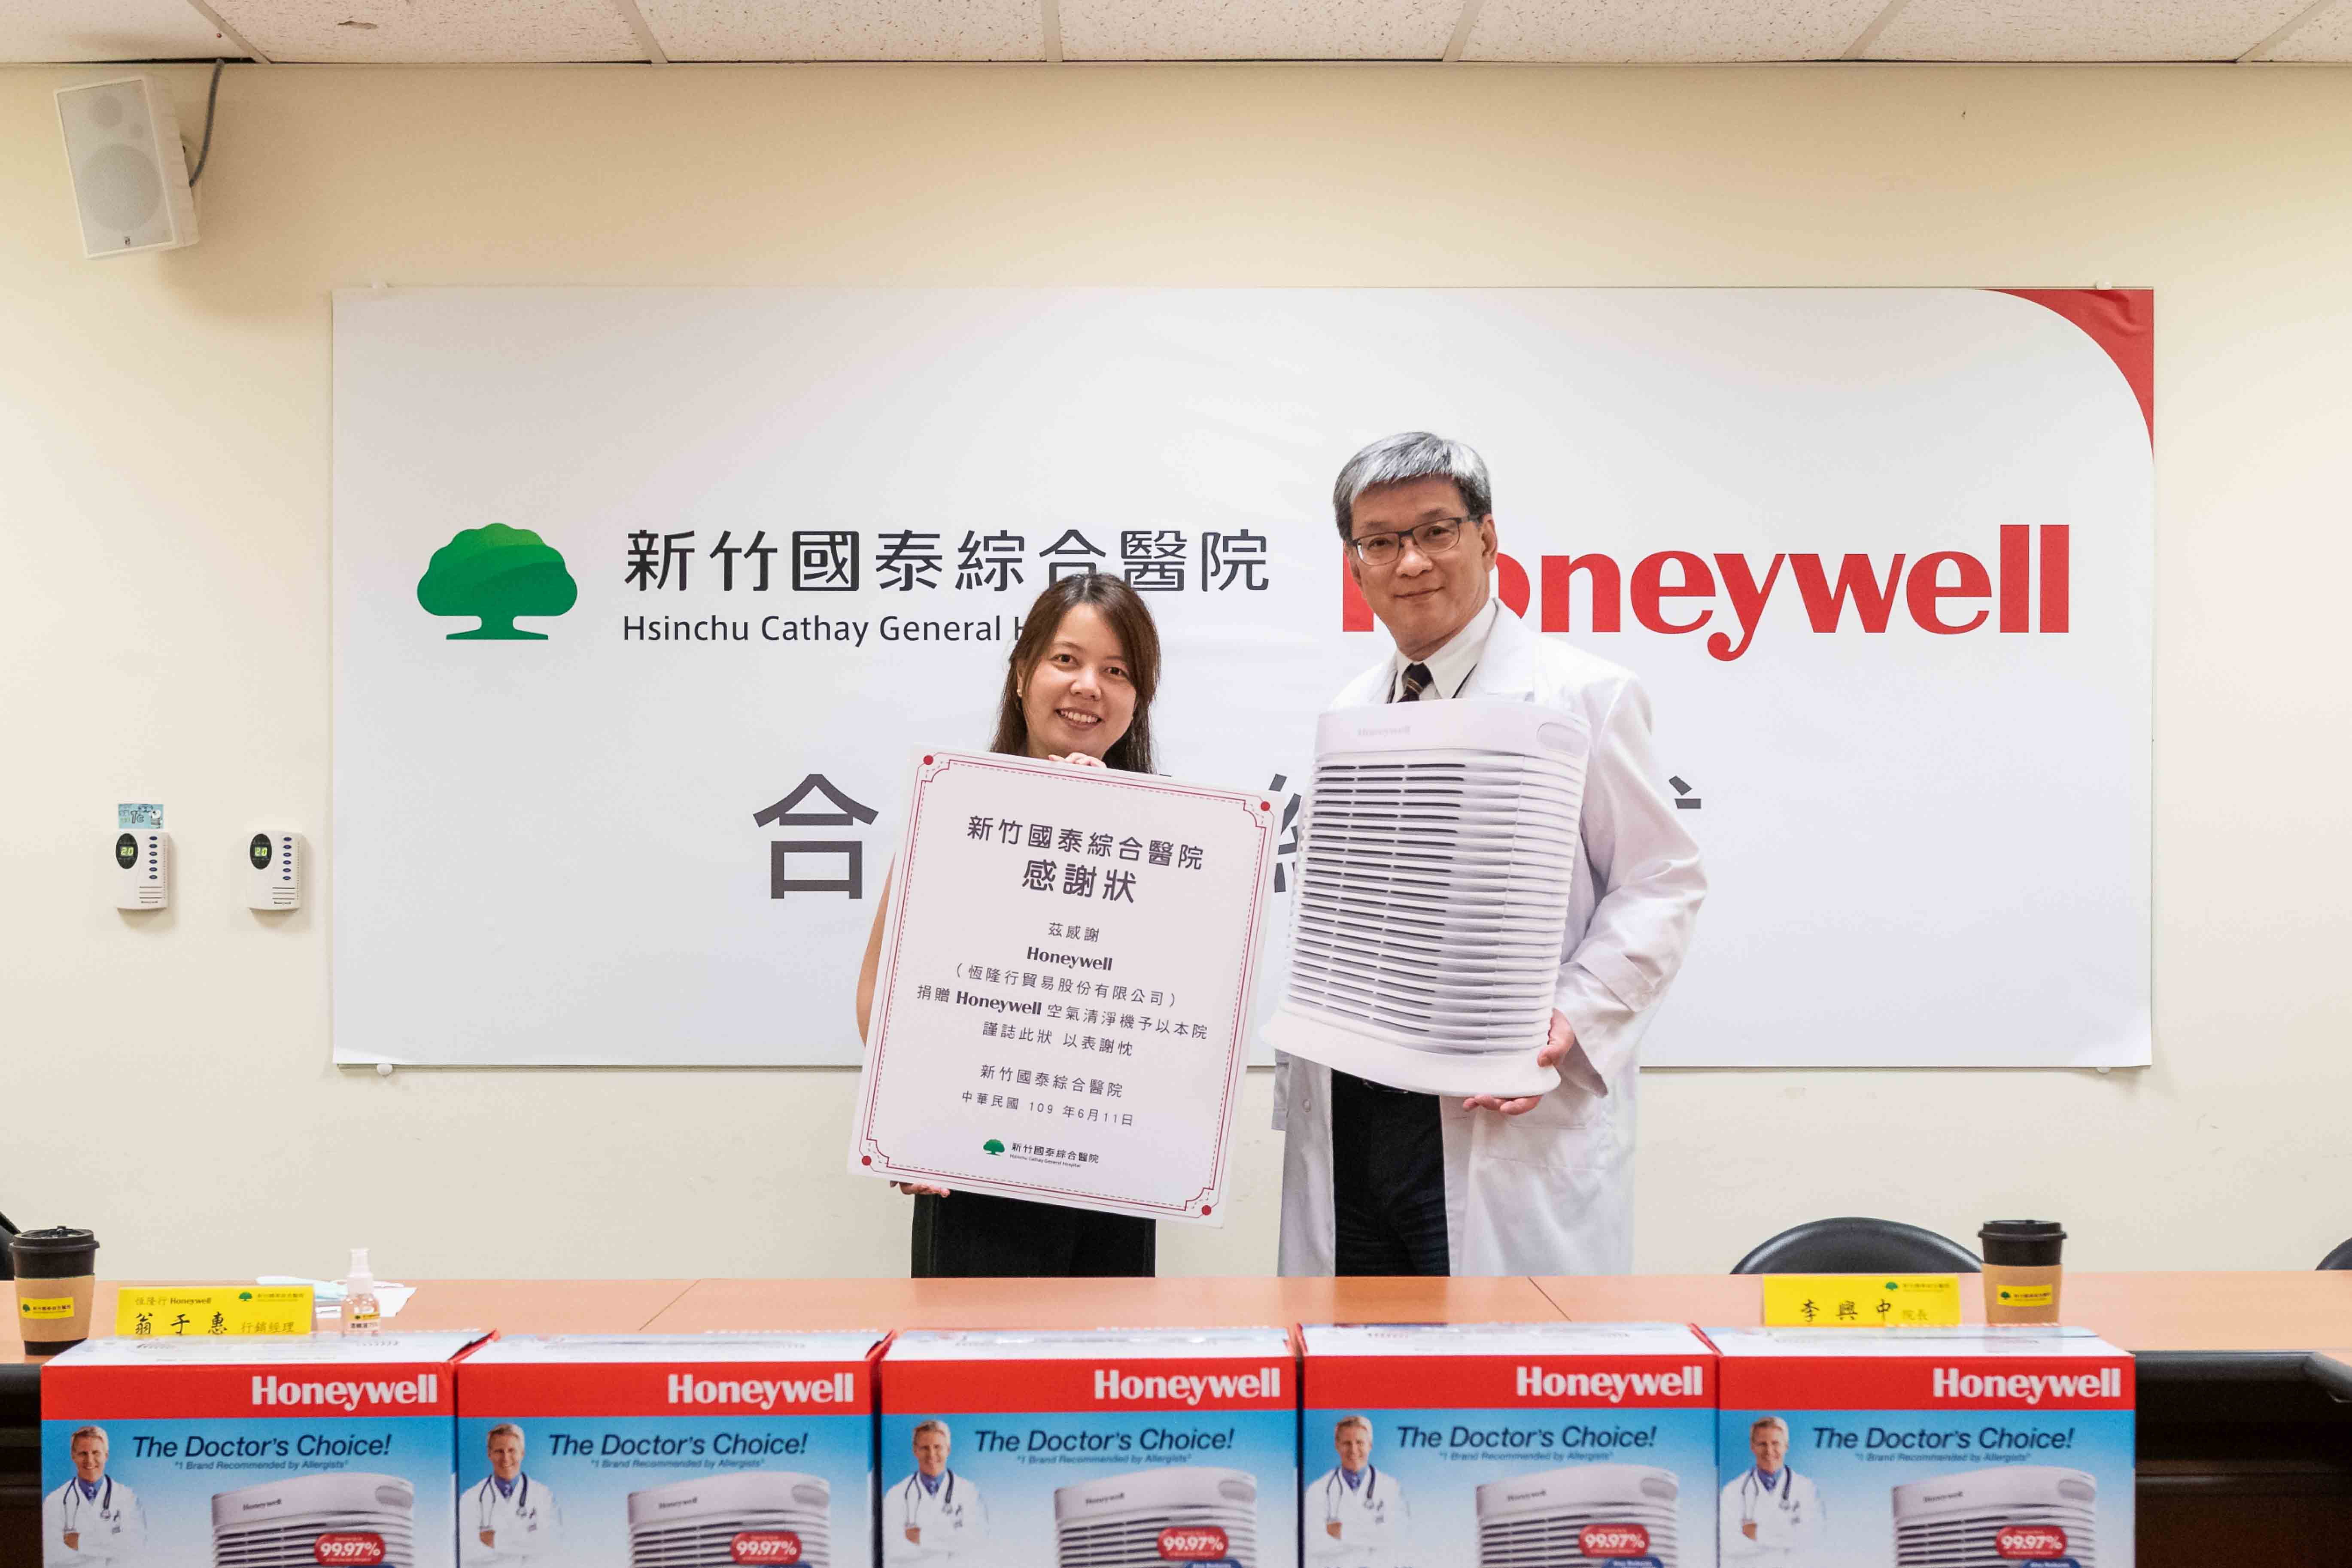 Honeywell贈予新竹國泰醫院清淨機 贈予儀式